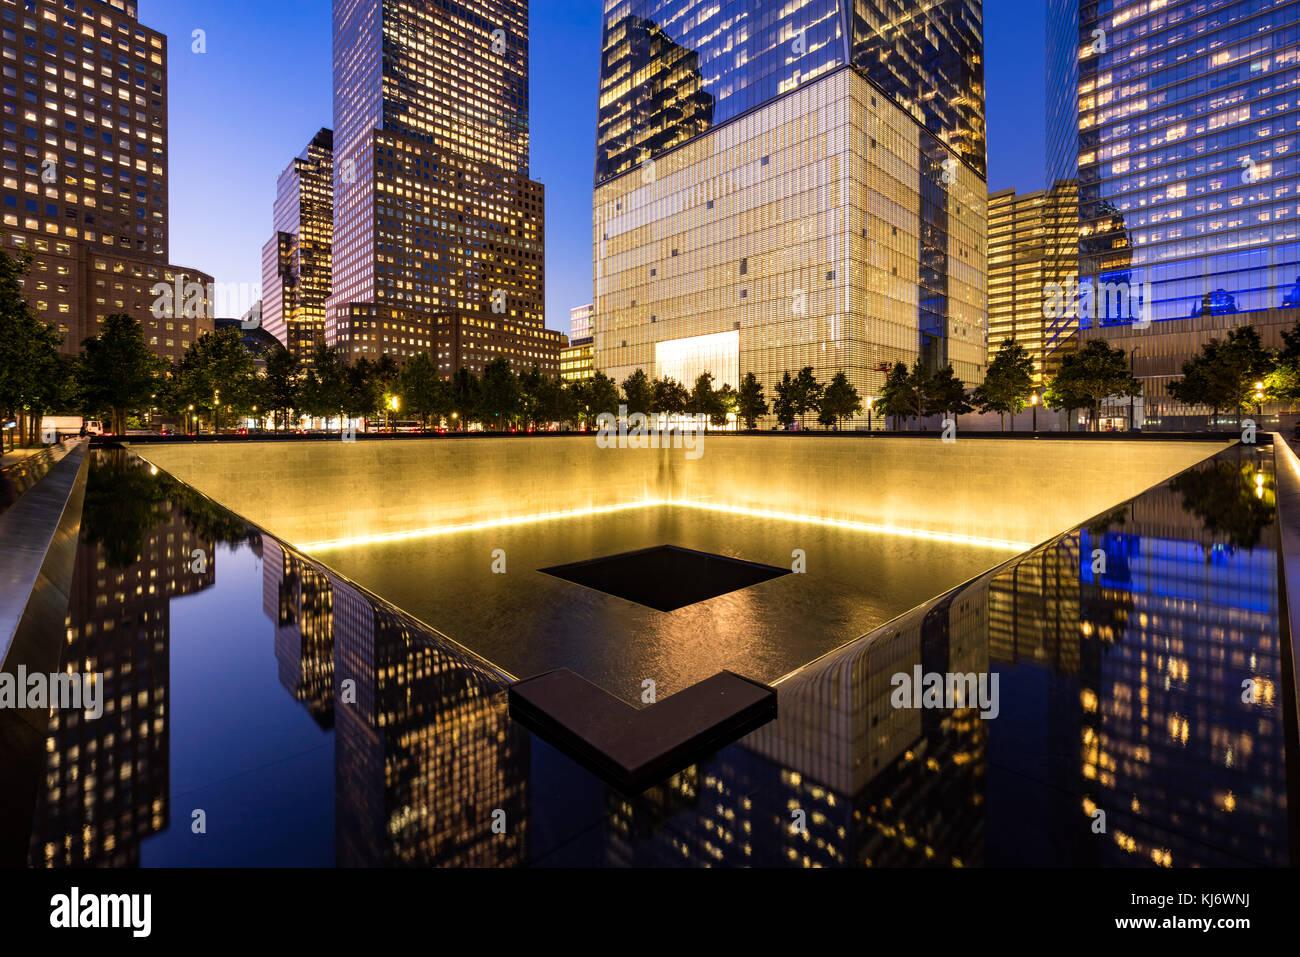 La piscina reflectante del Norte iluminado al atardecer con vista de One World Trade Center. Lower Manhattan, 9/11 Foto de stock